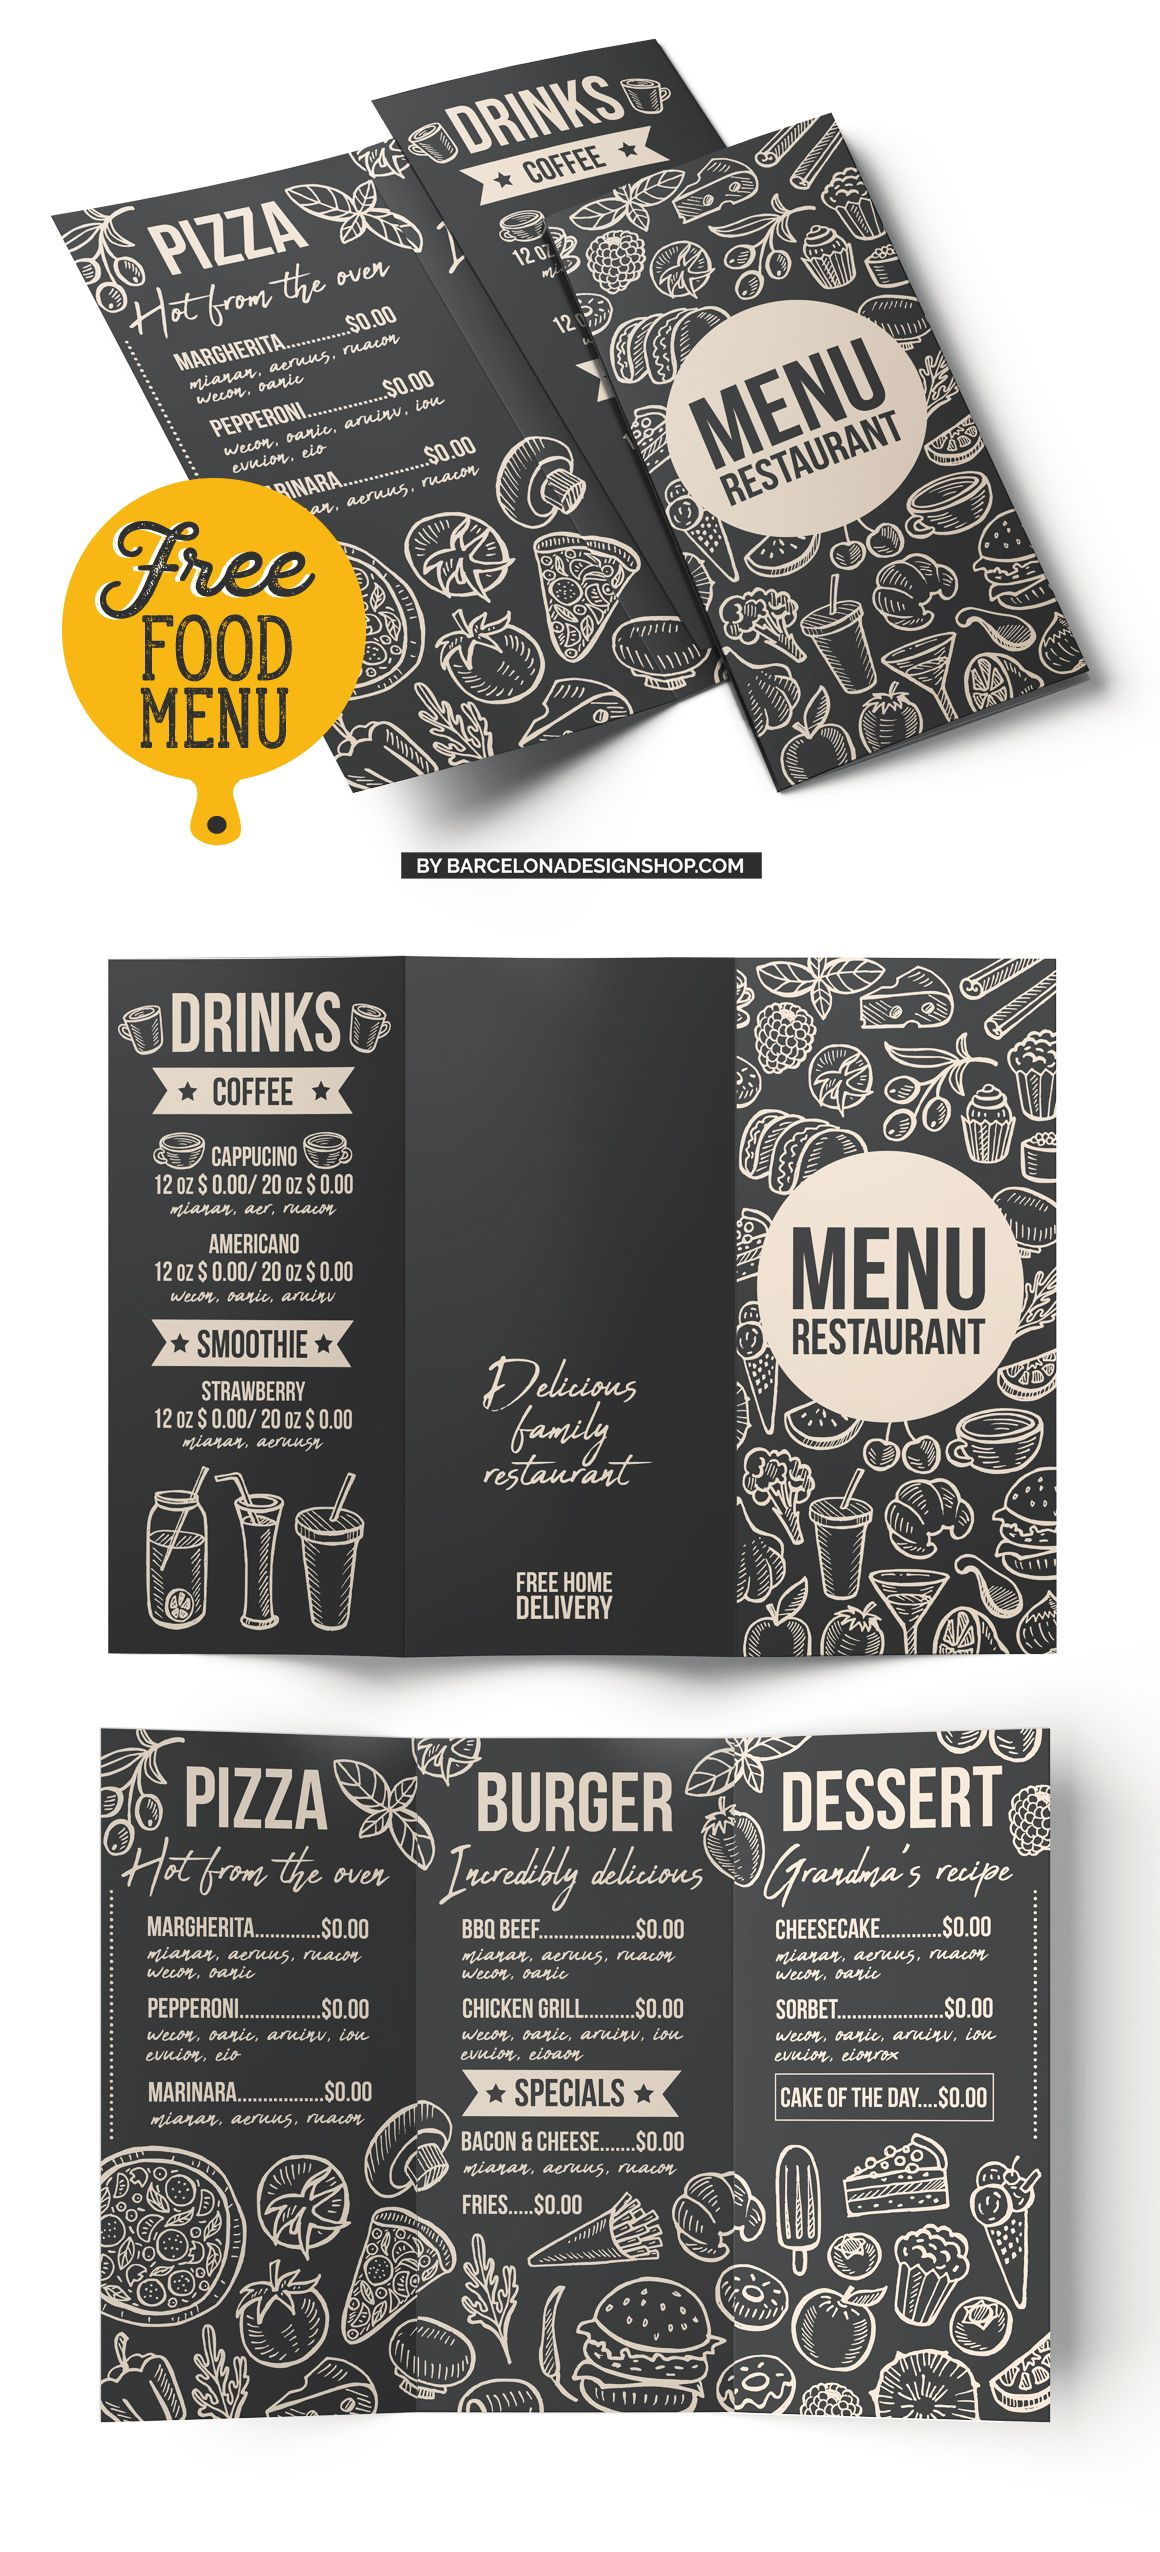 Free food menu template restaurant photoshop psd burger pizza ...